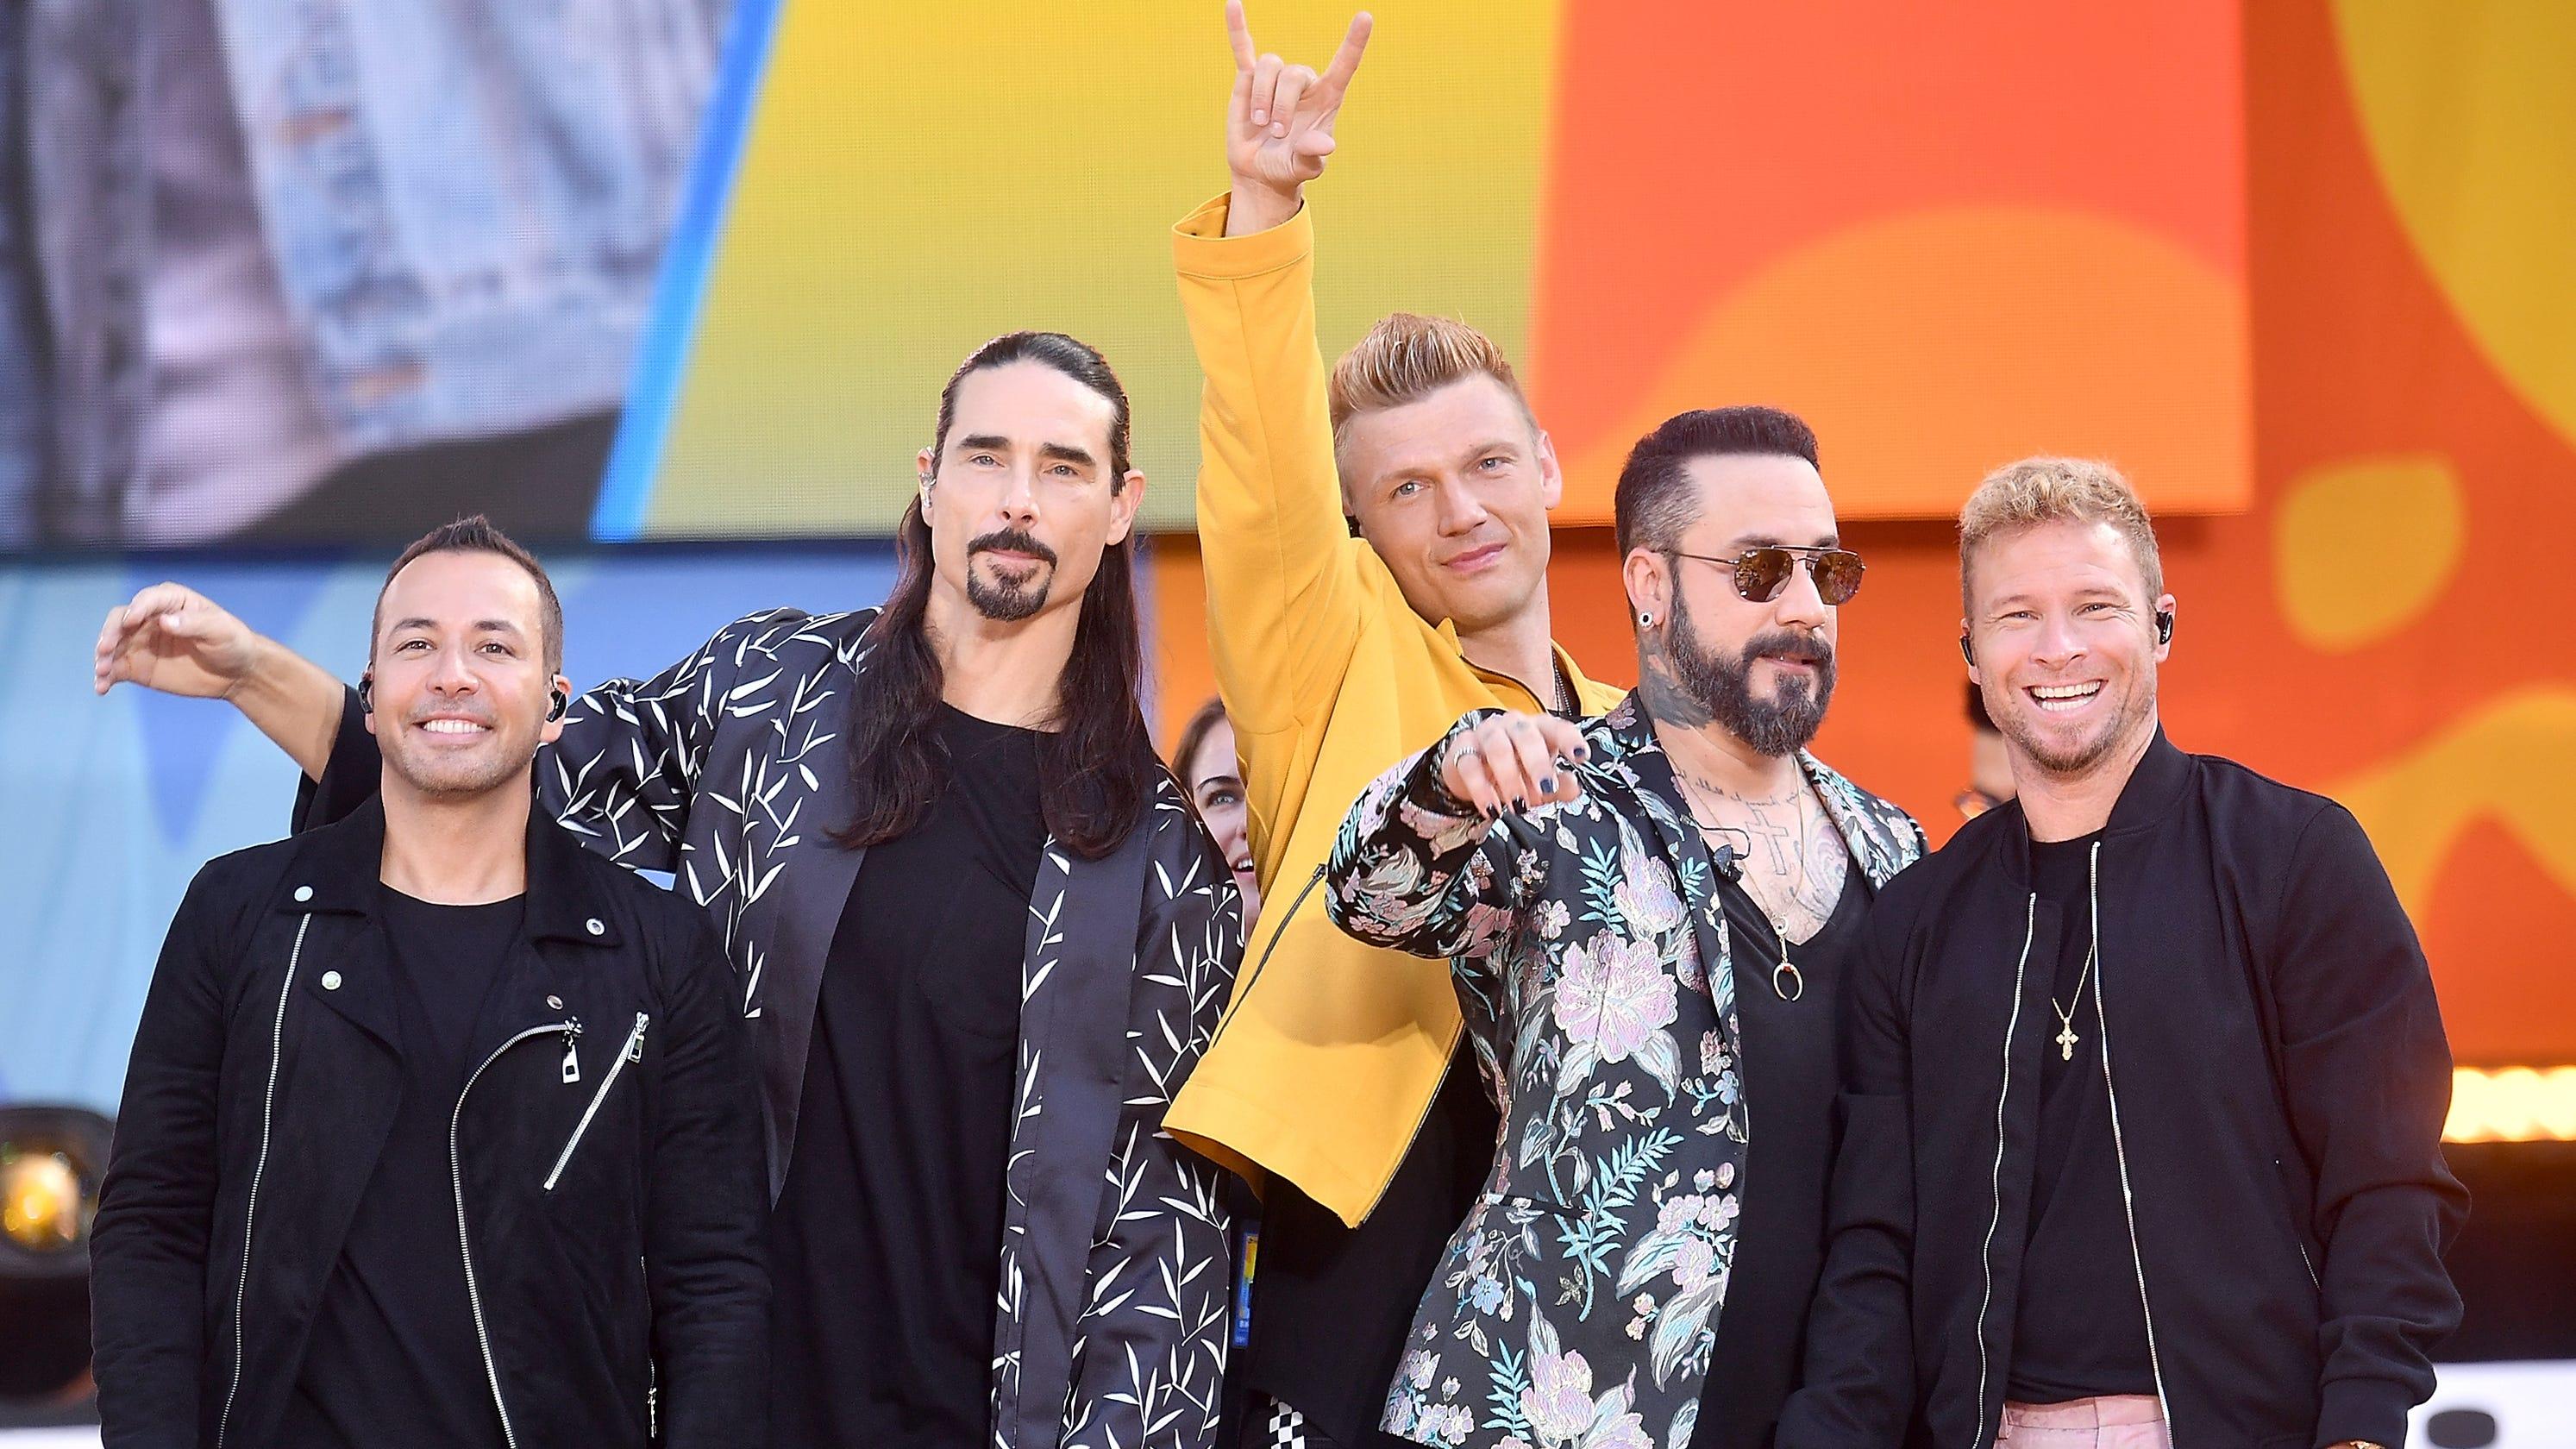 backstreet boys  Backstreet Boys show off kids in adorable 'No Place' music video